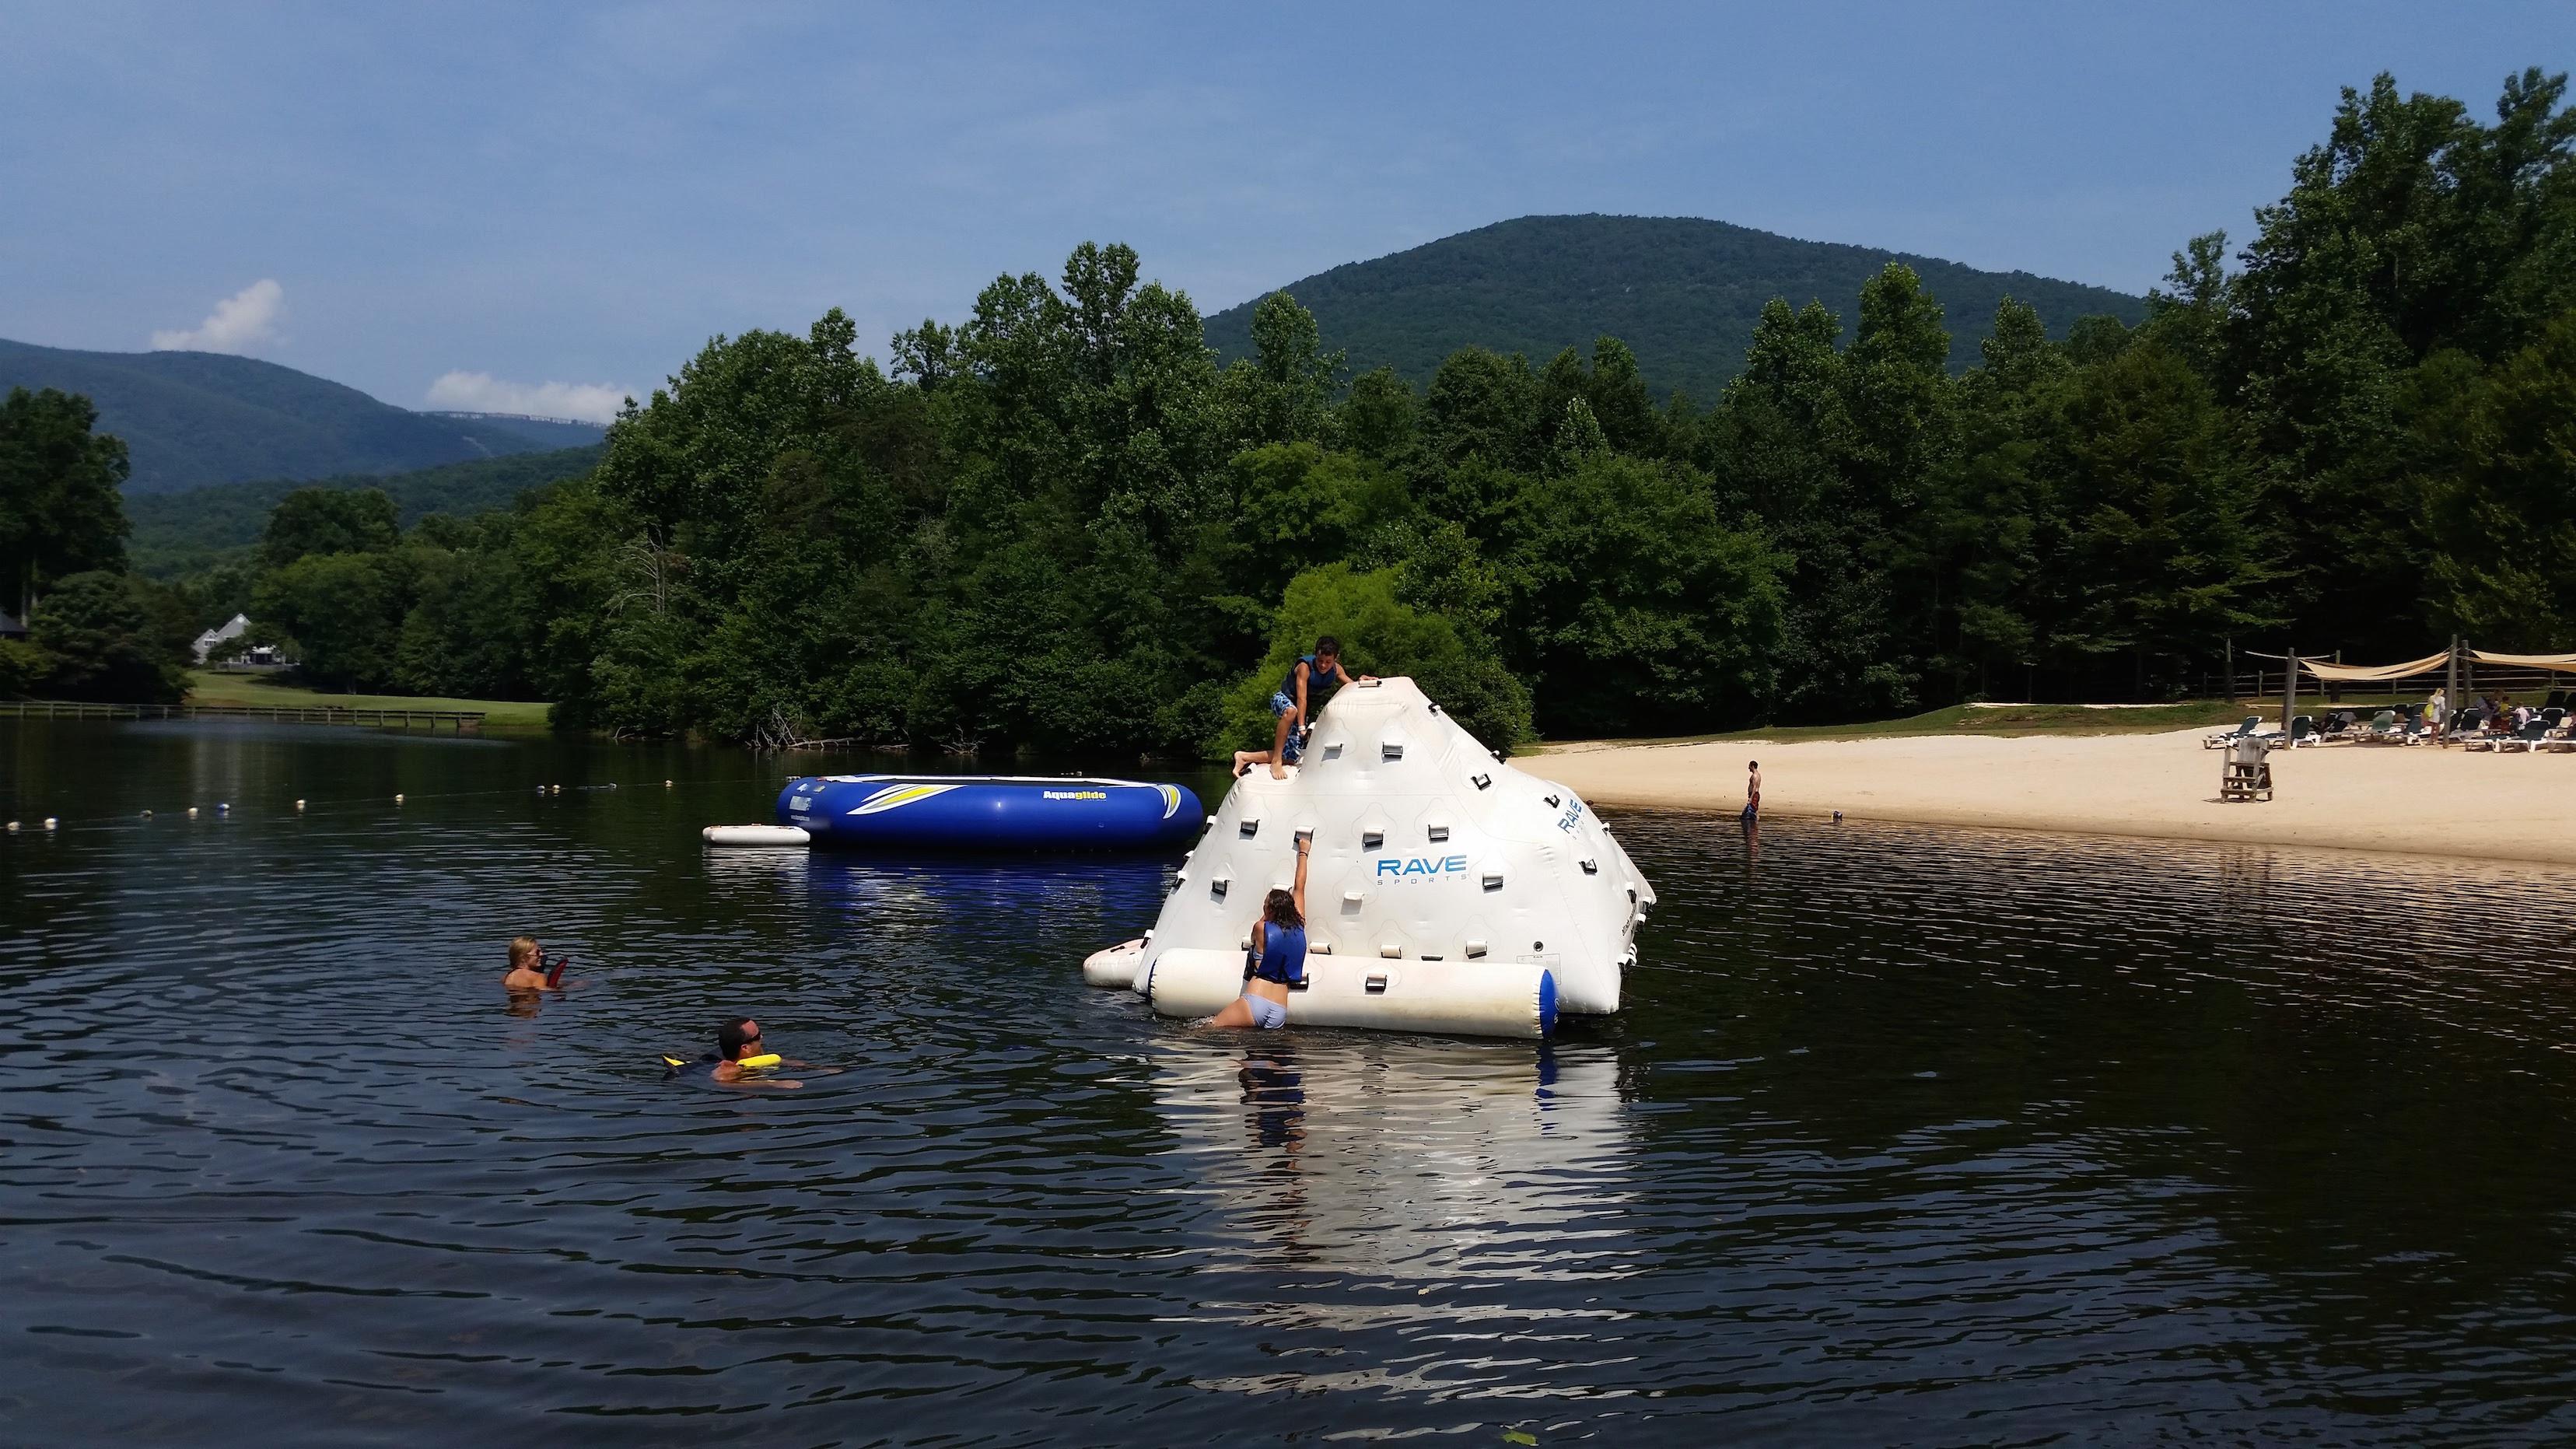 10 reasons to love Wintergreen Resort in summer